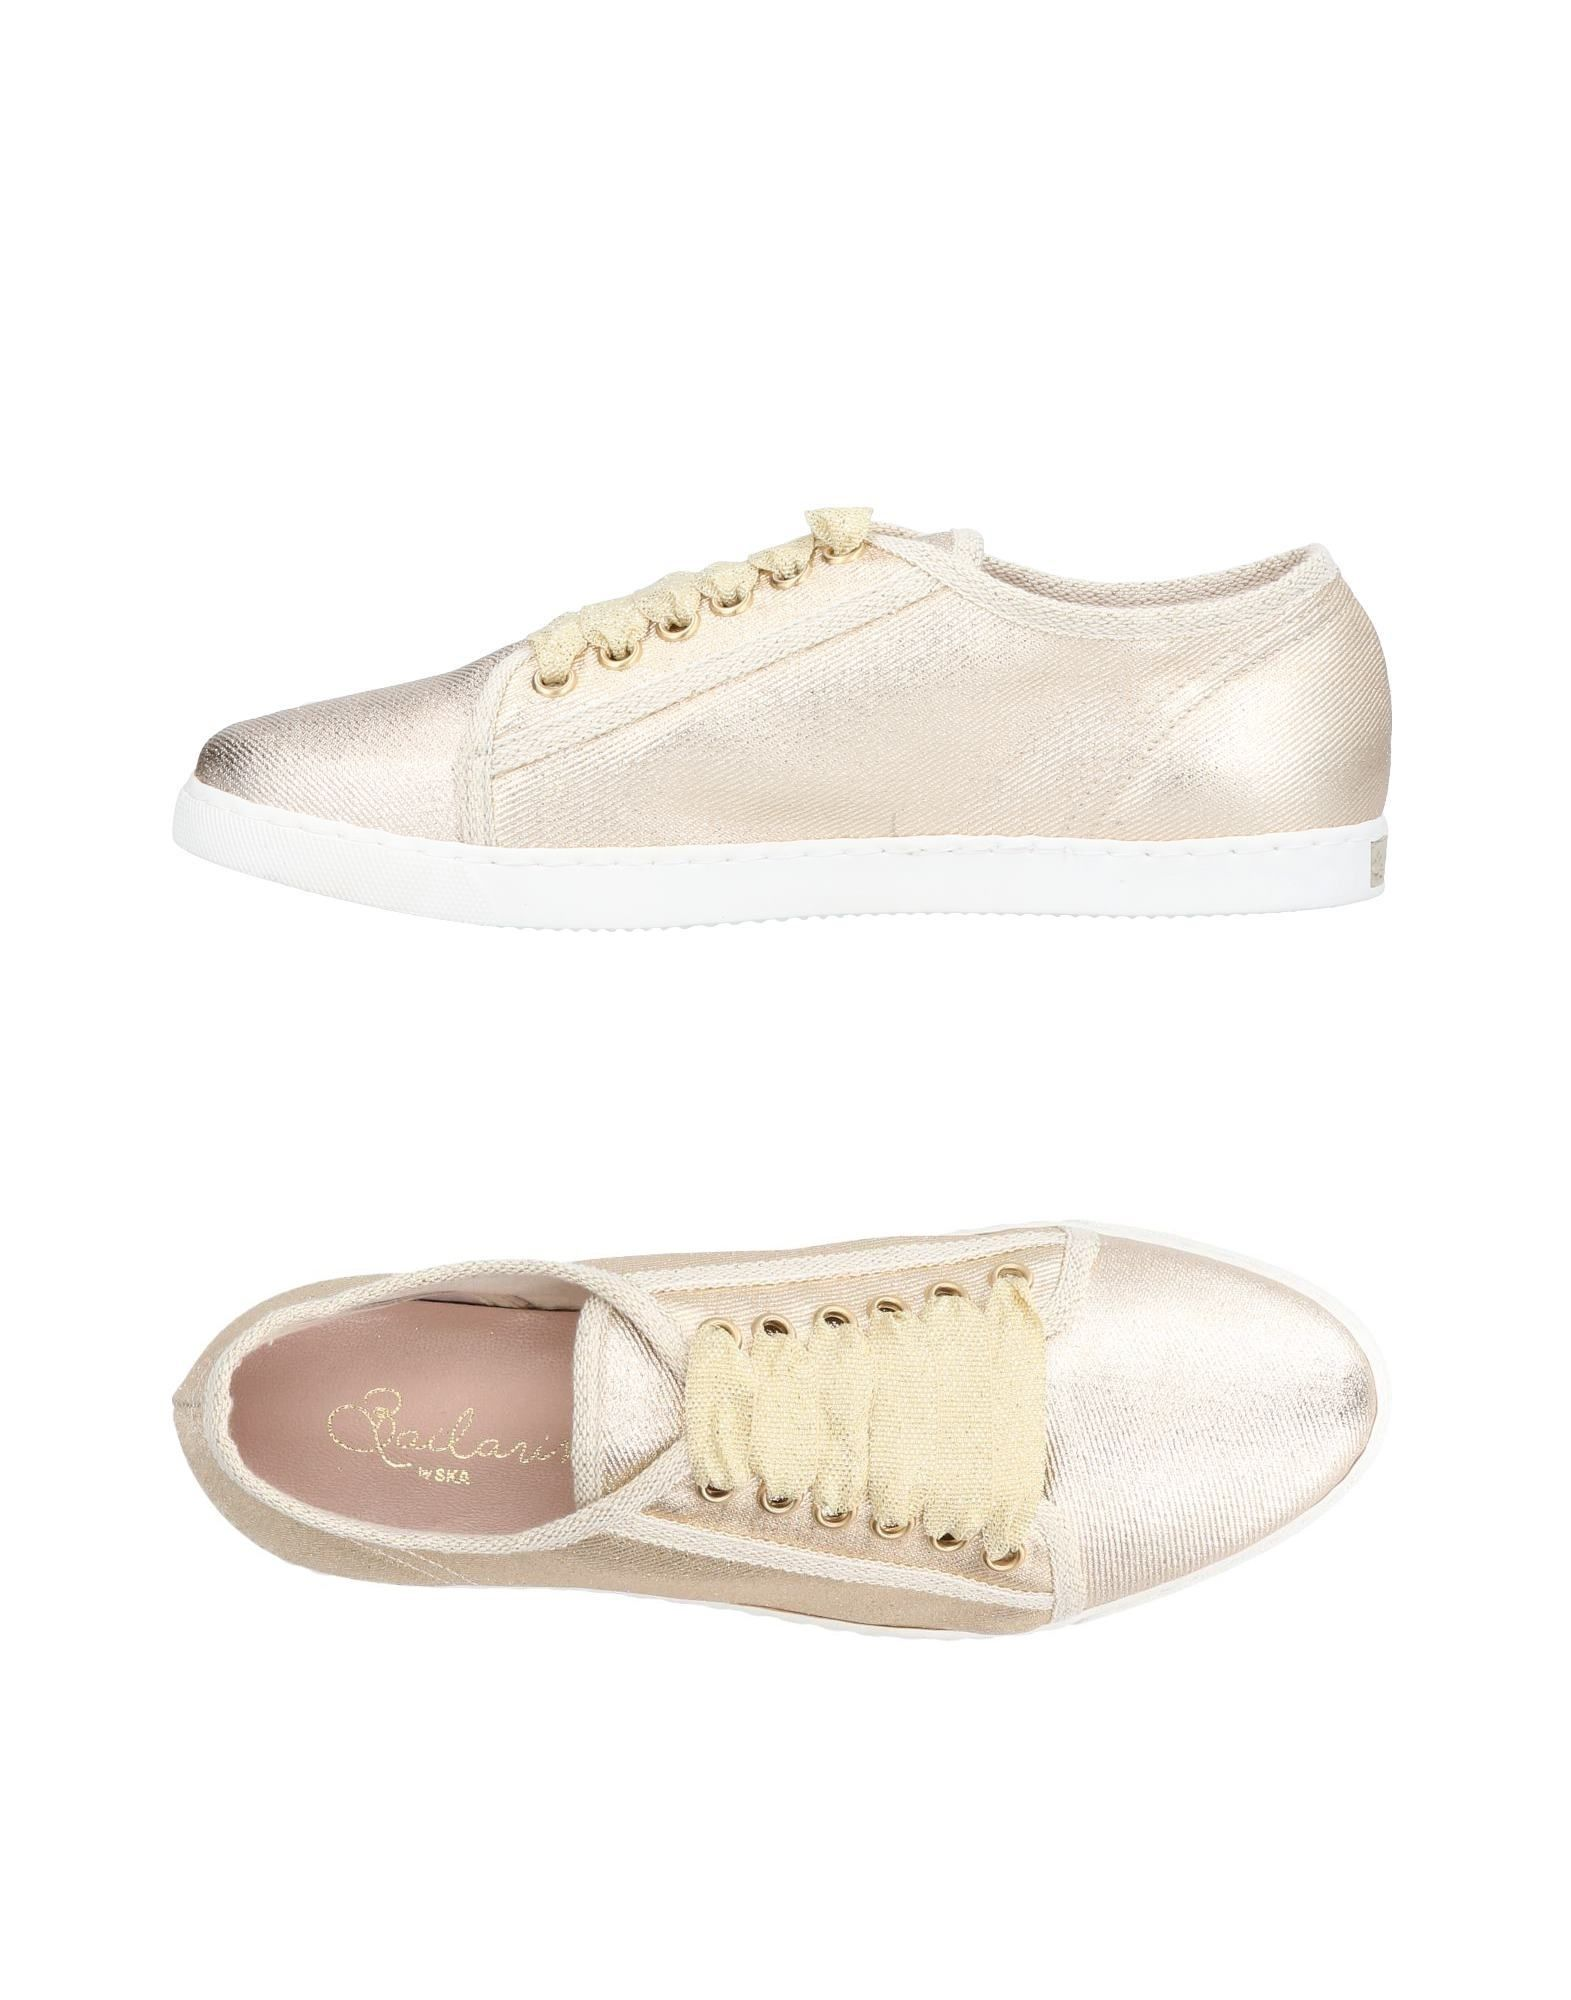 Bailarina By Ska Sneakers - Sneakers Women Bailarina By Ska Sneakers - online on  United Kingdom - 11466712JT e621fe